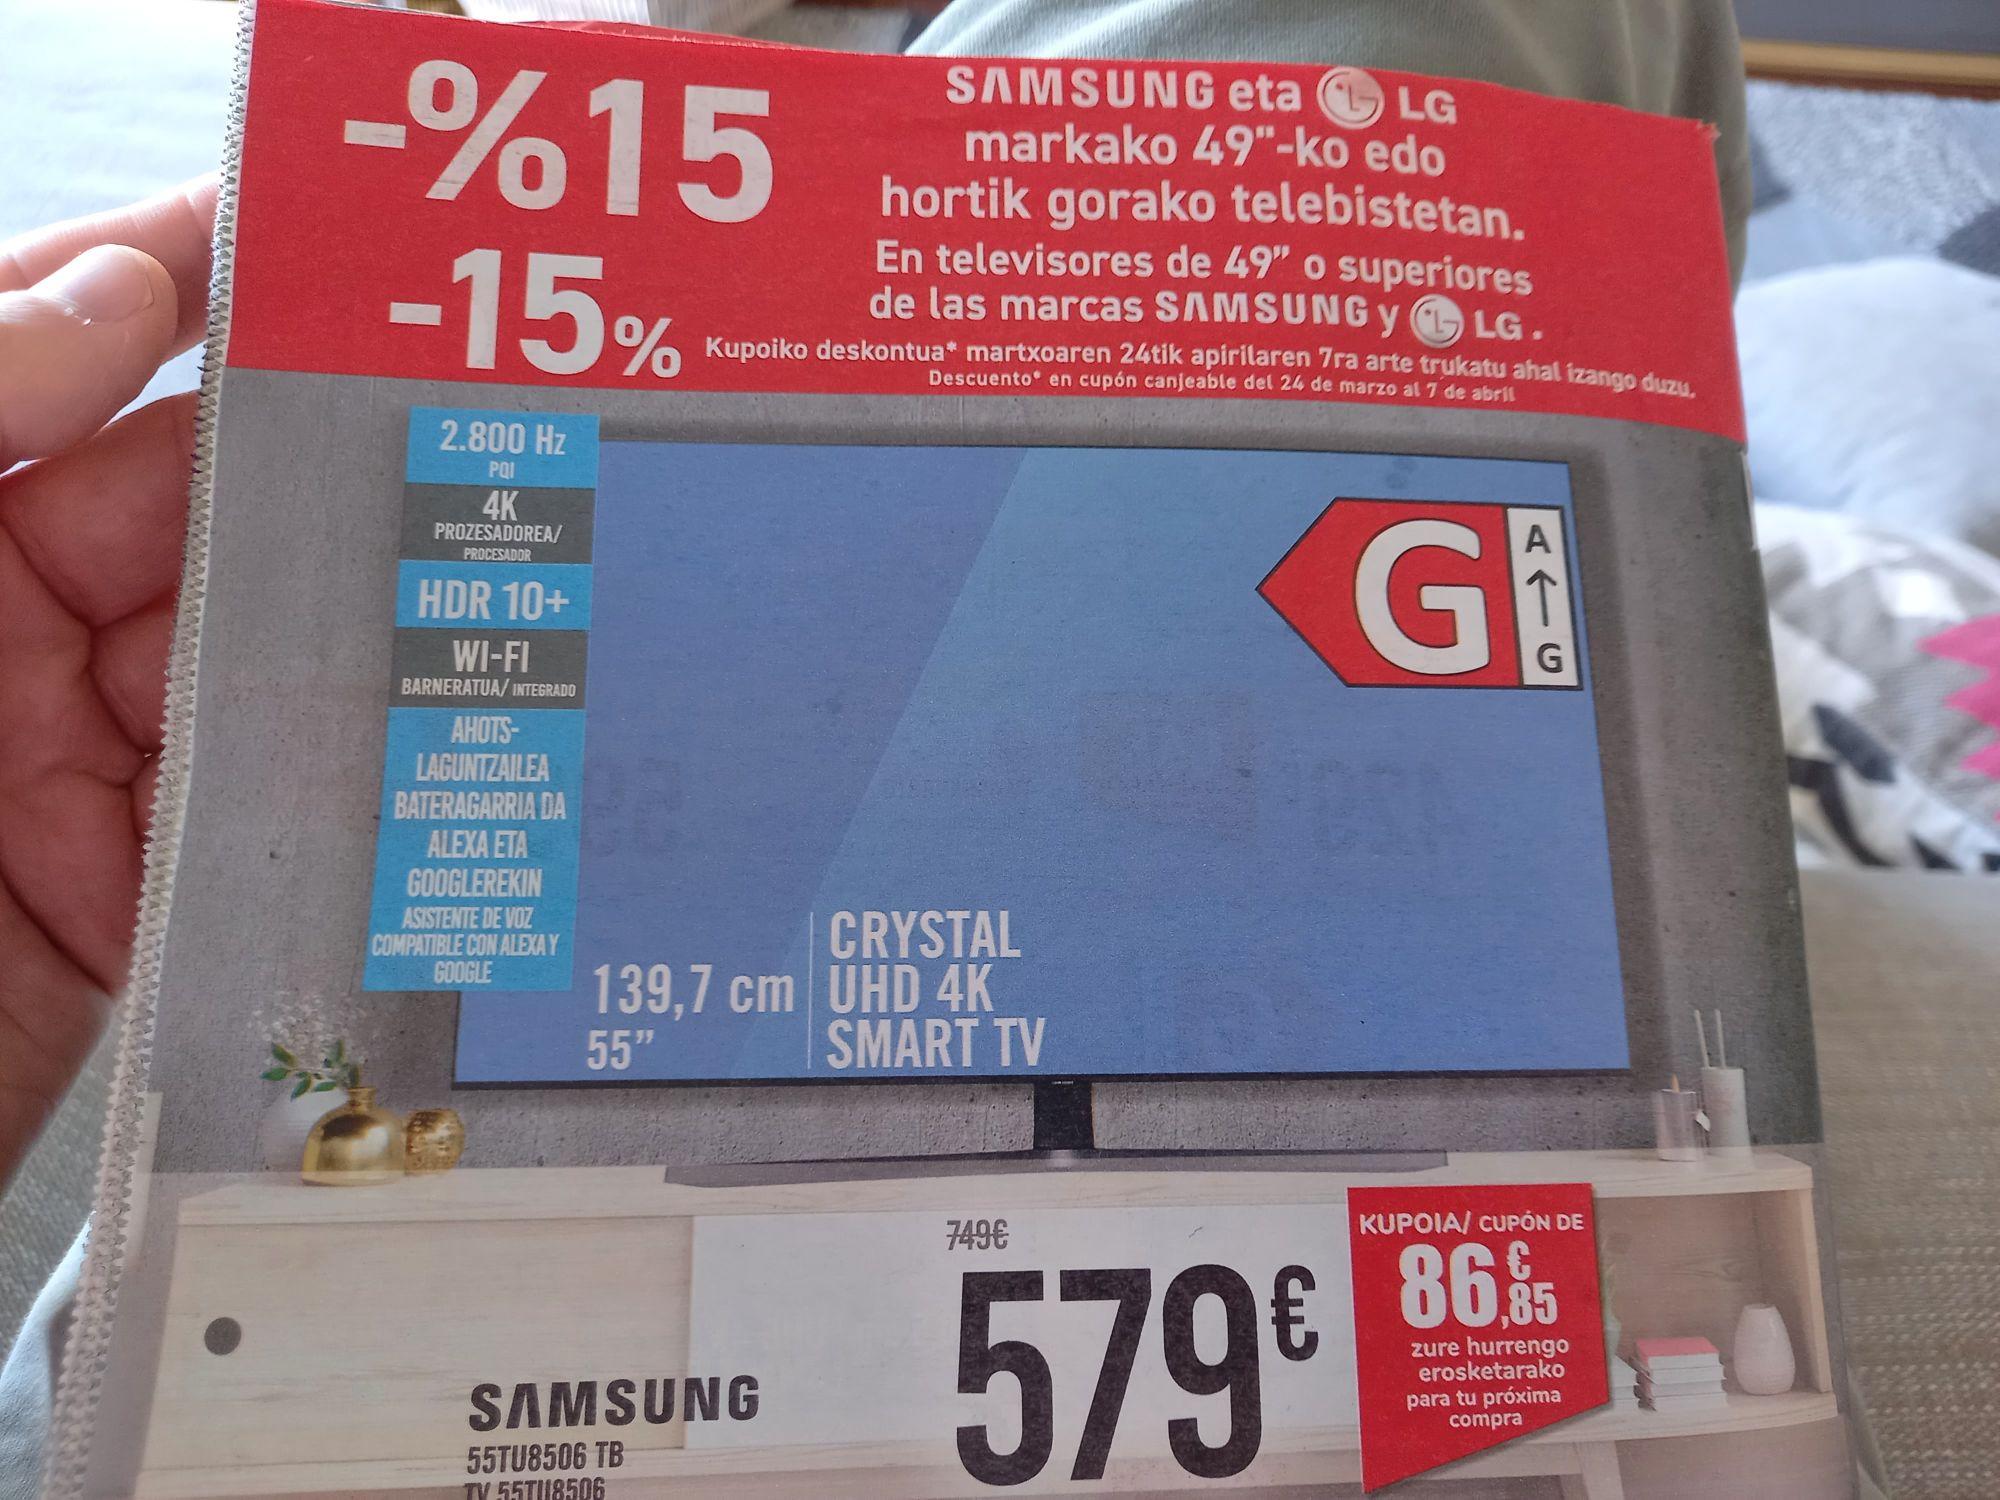 TV 4K Crystal UHD 55TU8506 Dual Led + HDR 10+